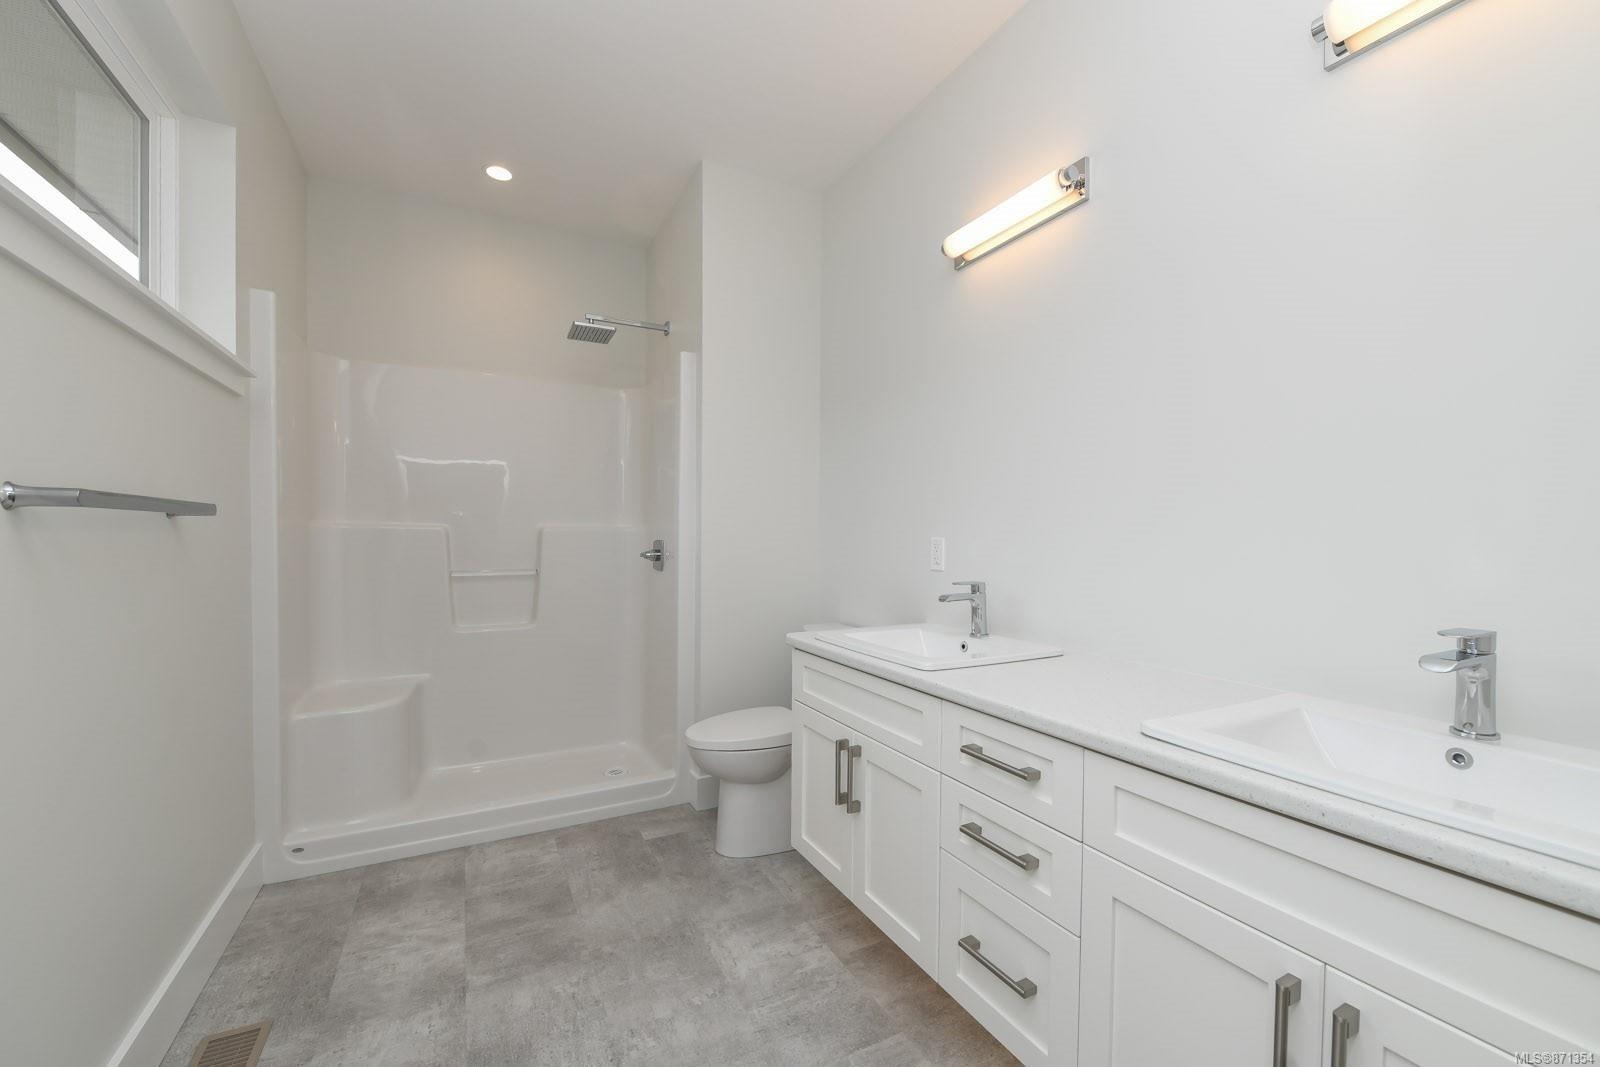 Photo 25: Photos: 68 Grayhawk Pl in : CV Courtenay City House for sale (Comox Valley)  : MLS®# 871354